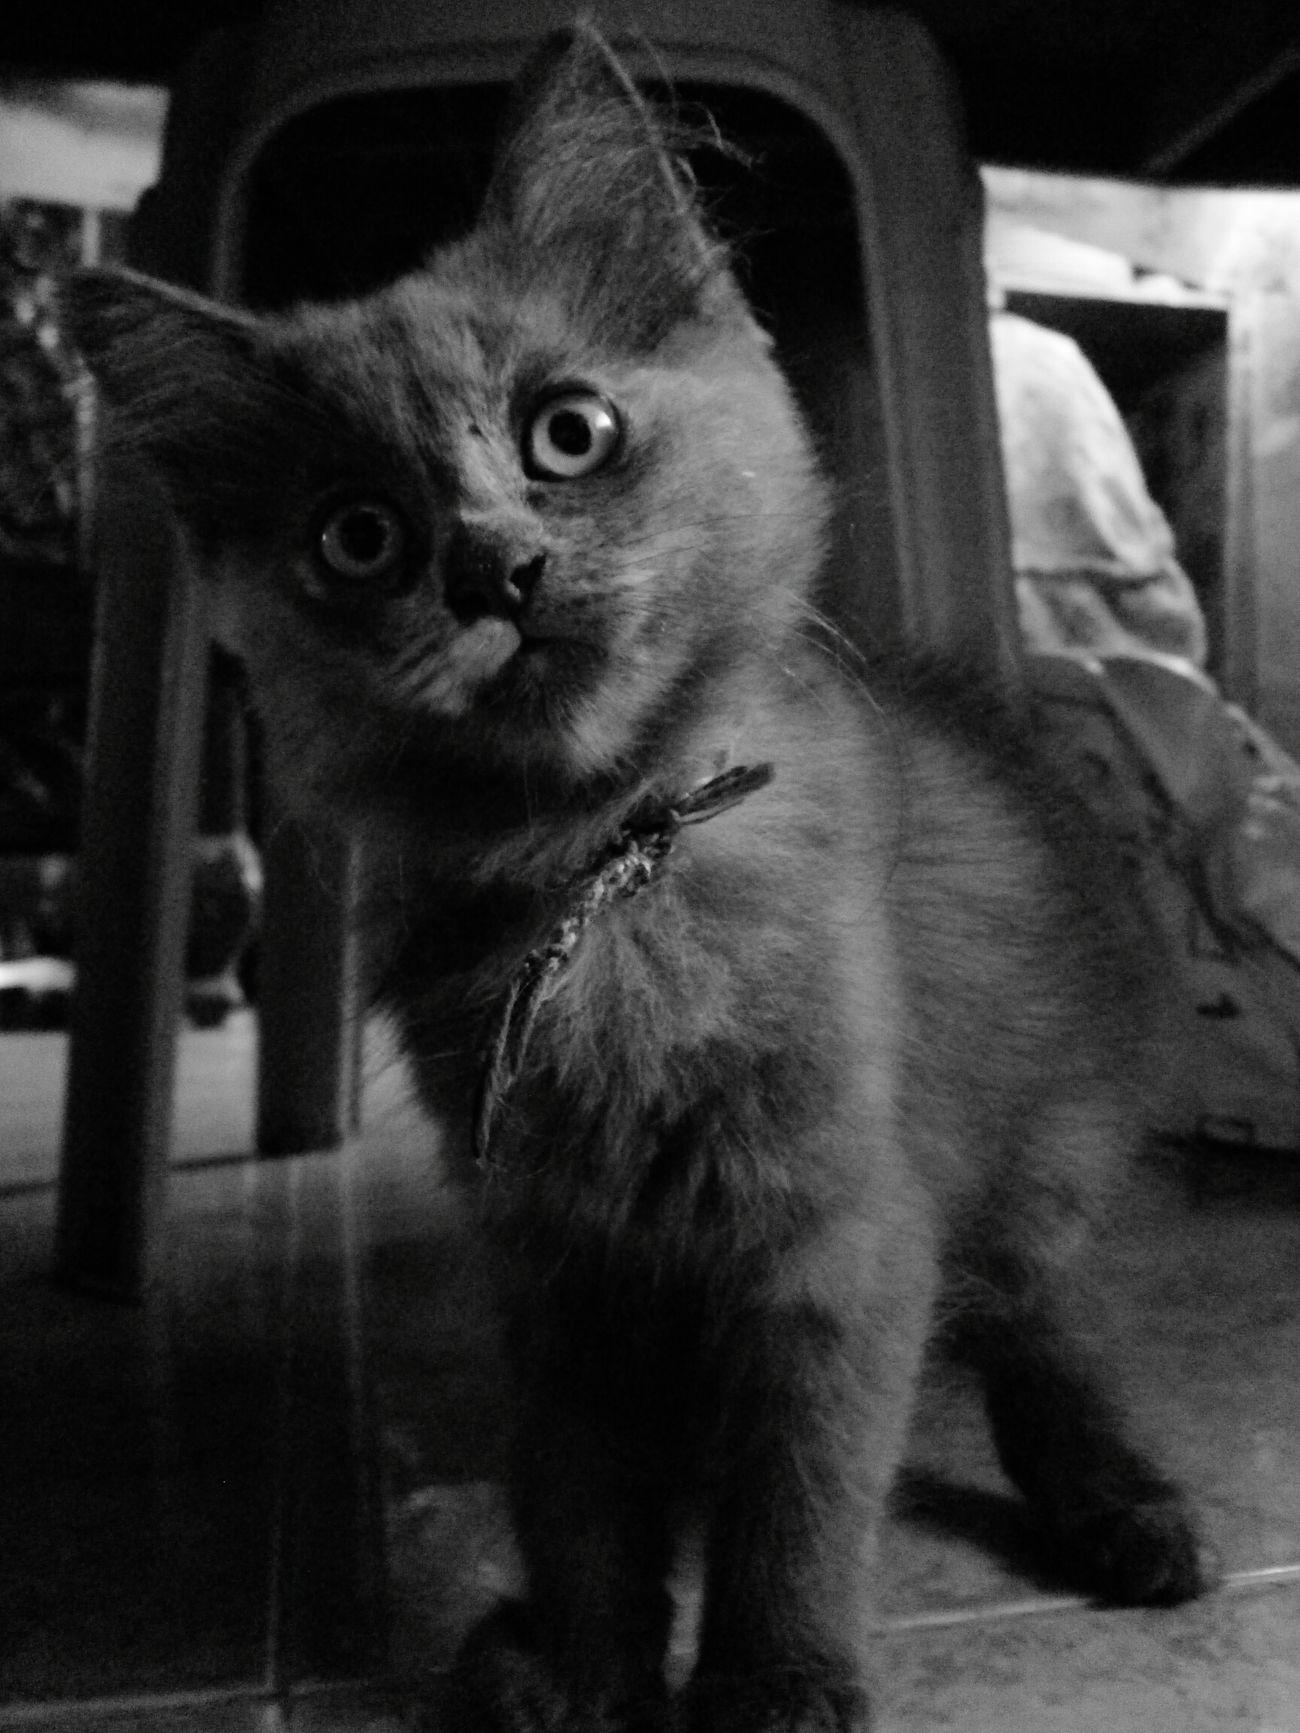 EyeemPhilippines PhonePhotography Petloverslife Instagramcats EyeEmCatlovers Catportrait